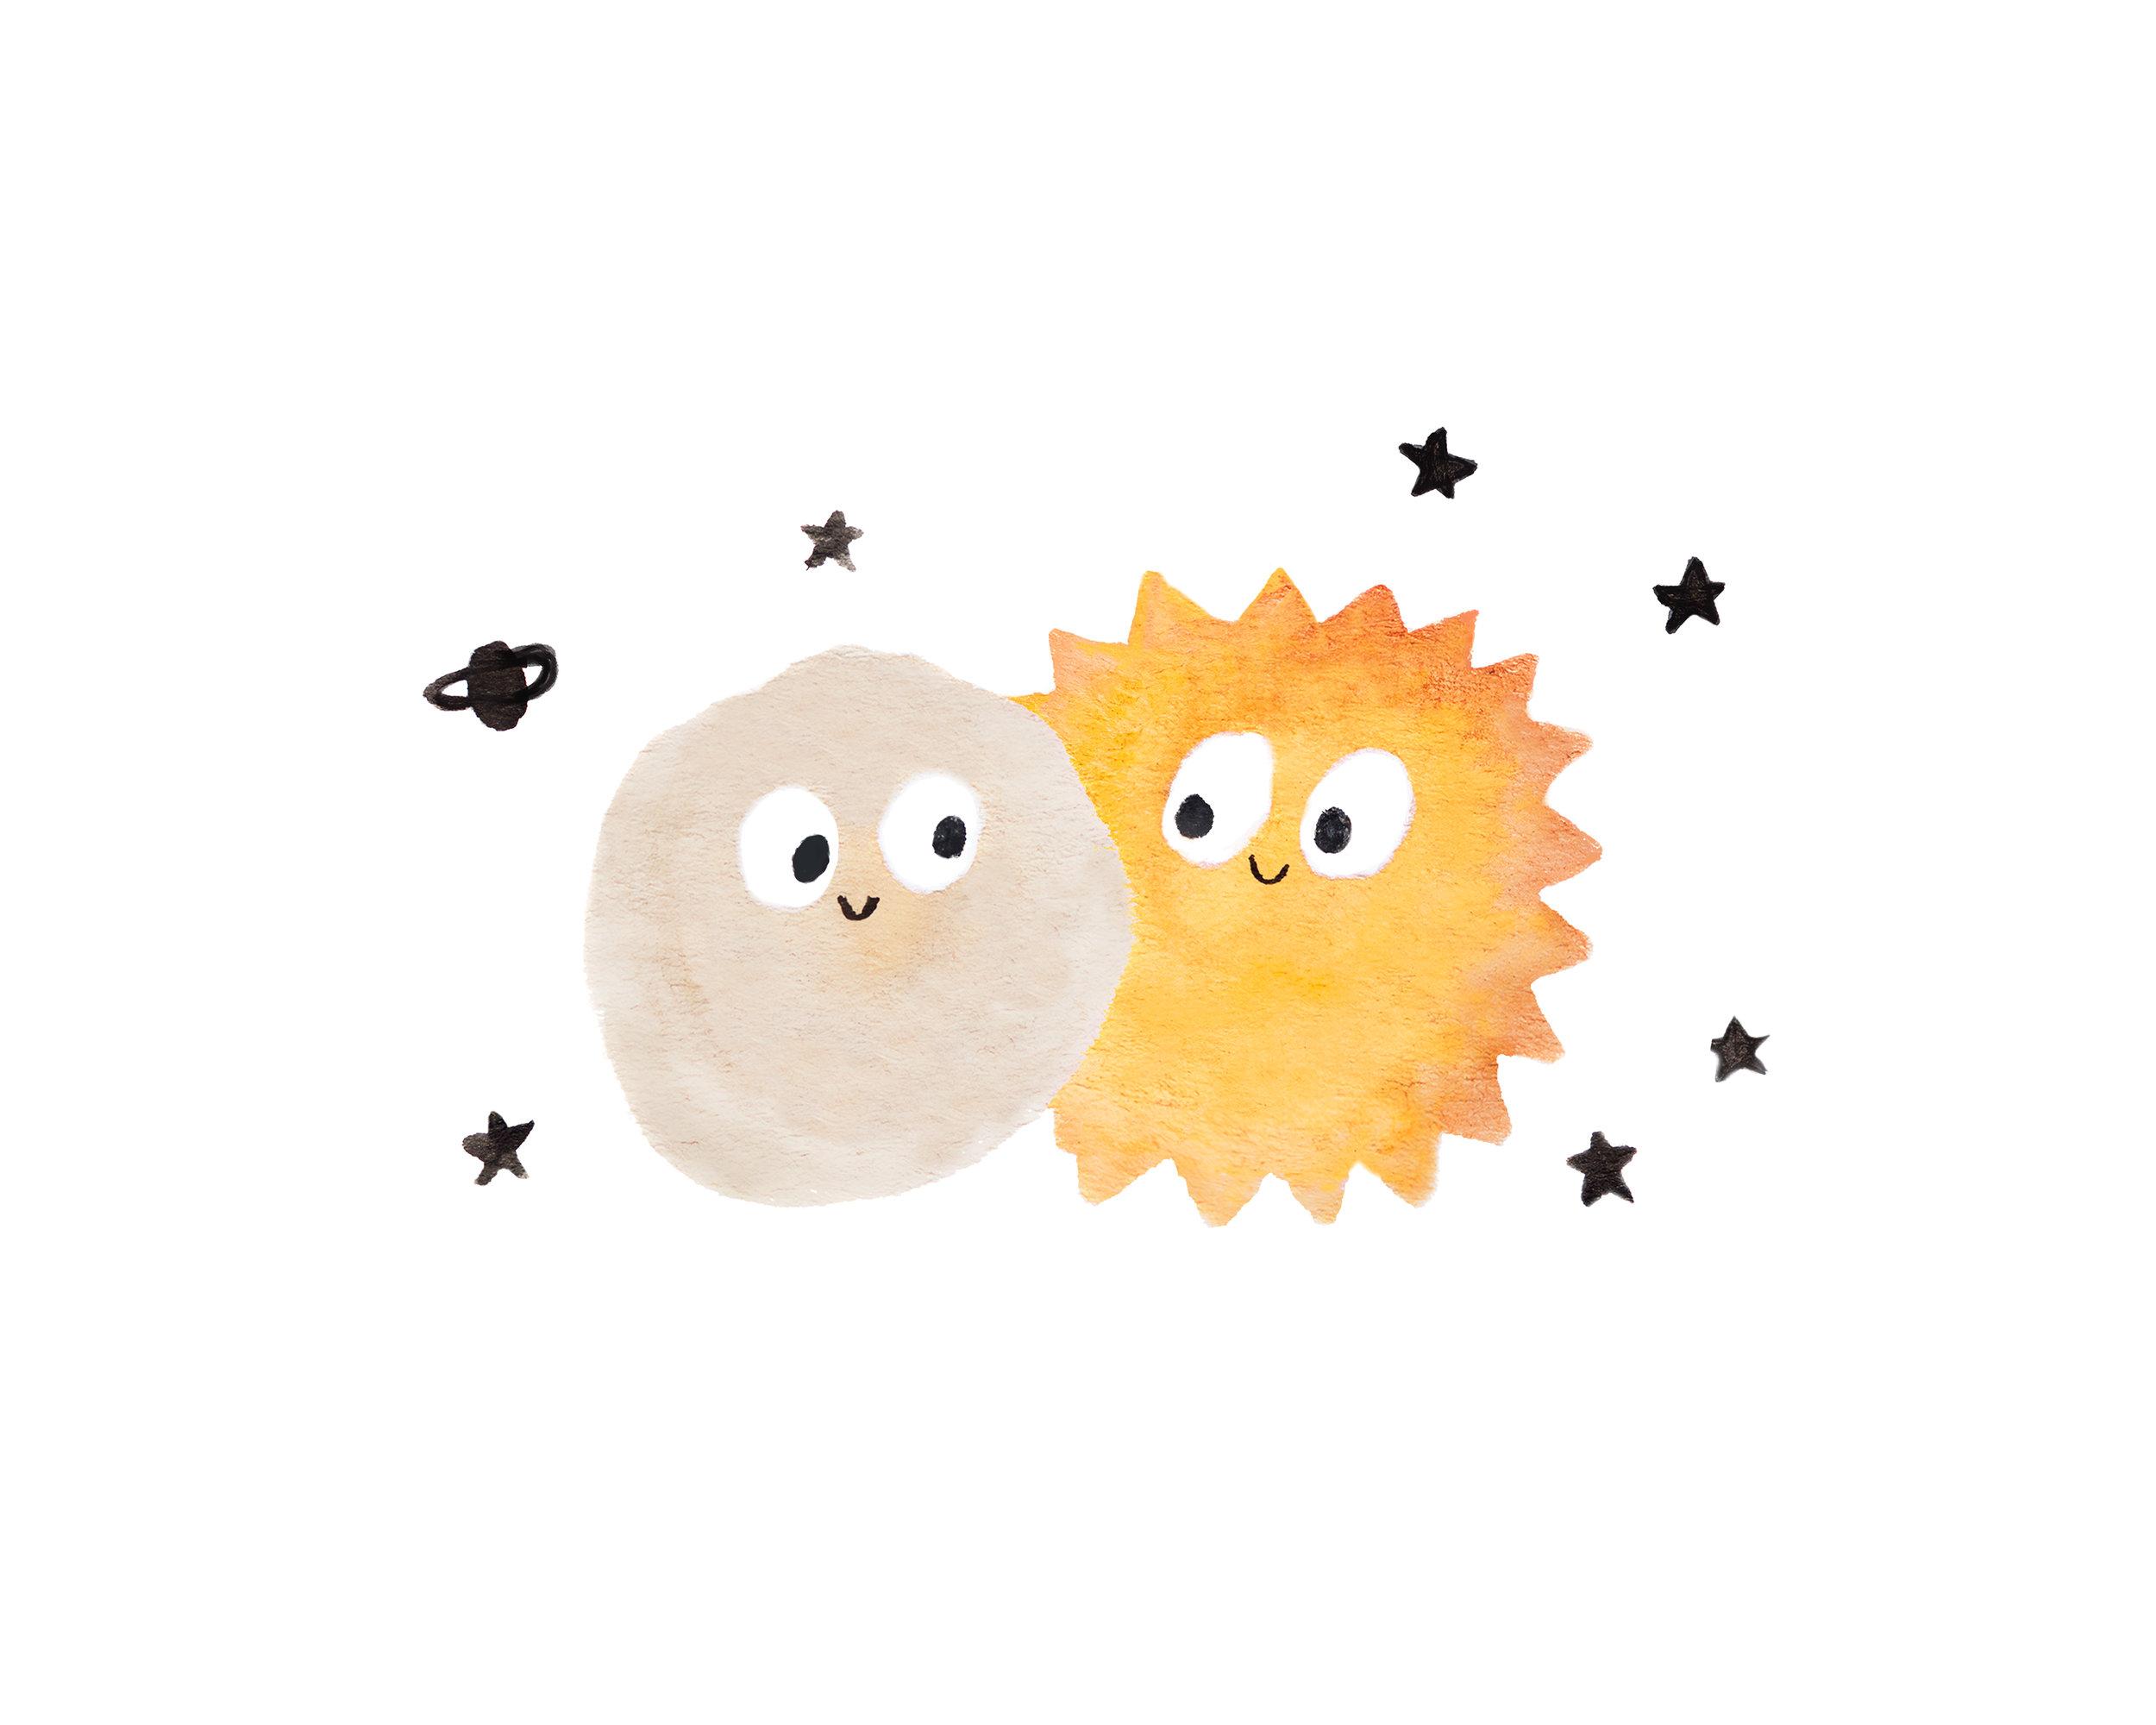 sun + moon 8x10.jpg